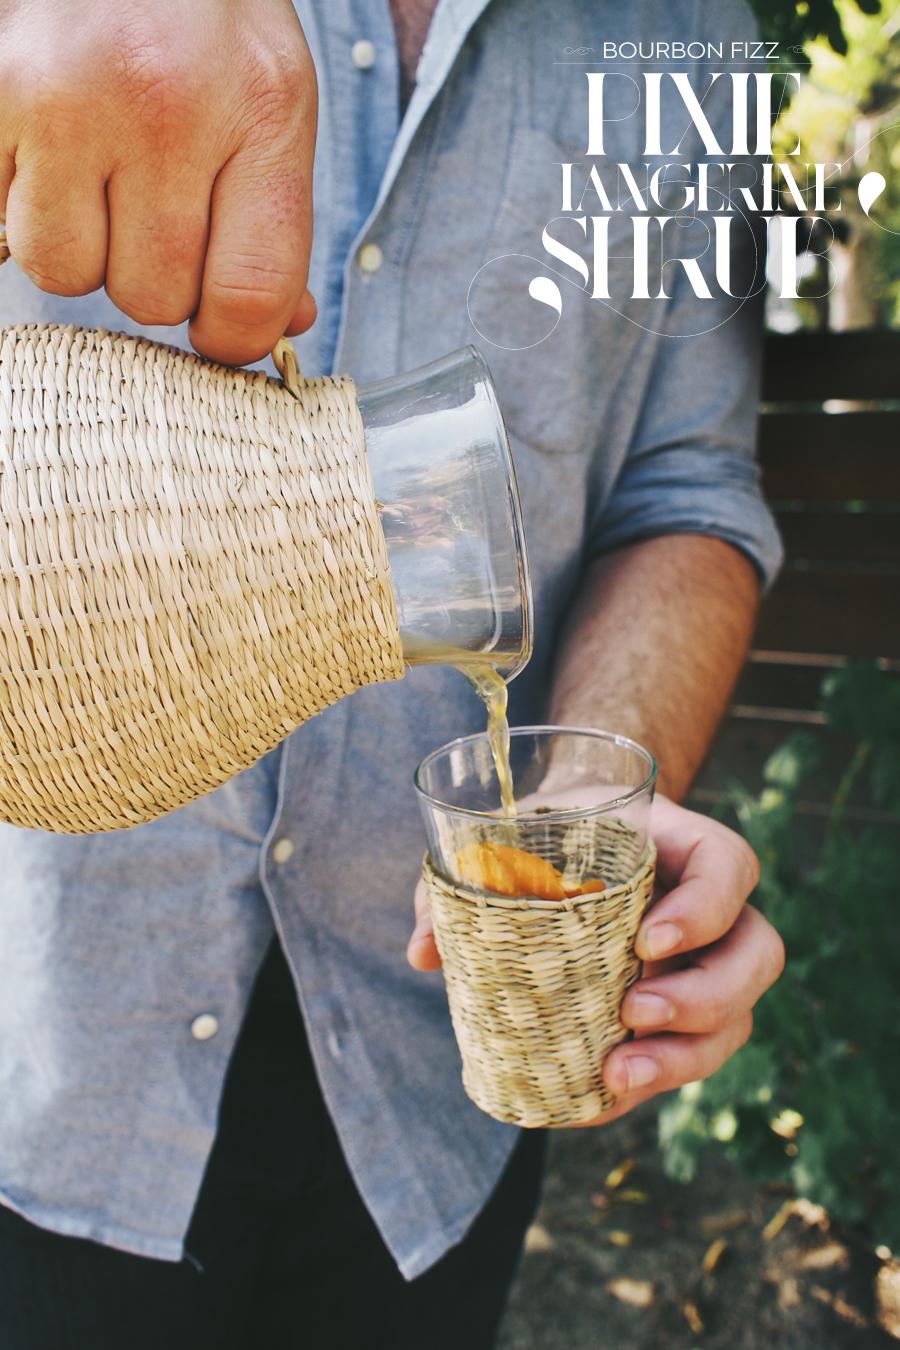 Bourbon Fizz Cocktail With Pixie Tangerine Shrub   Dine X Design